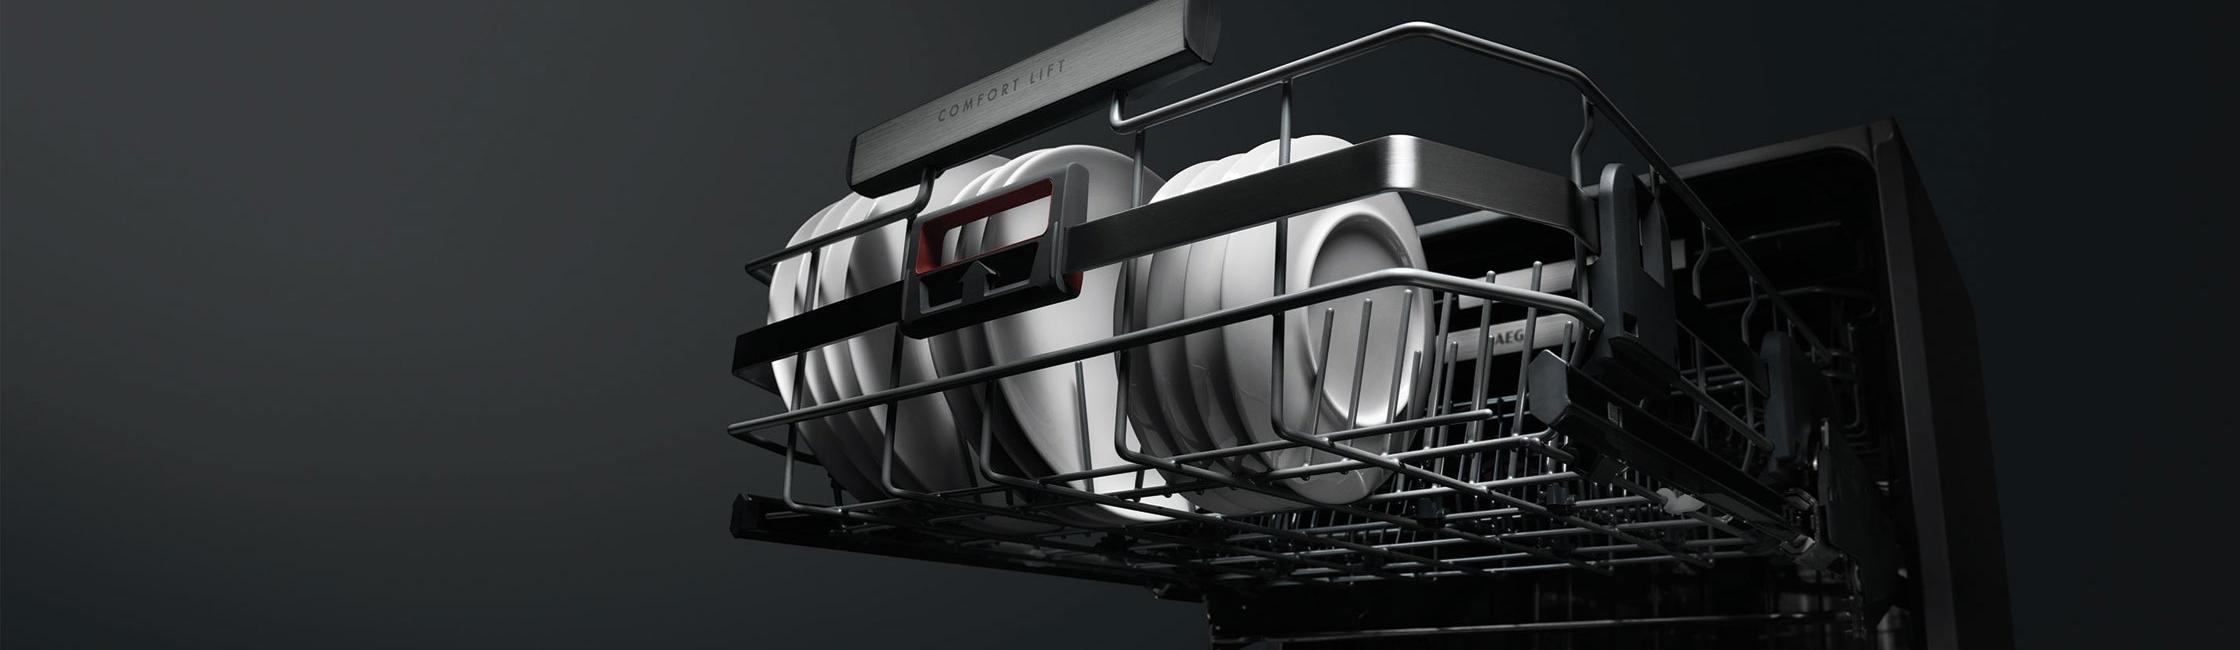 aeg  dishwashers comfortlift